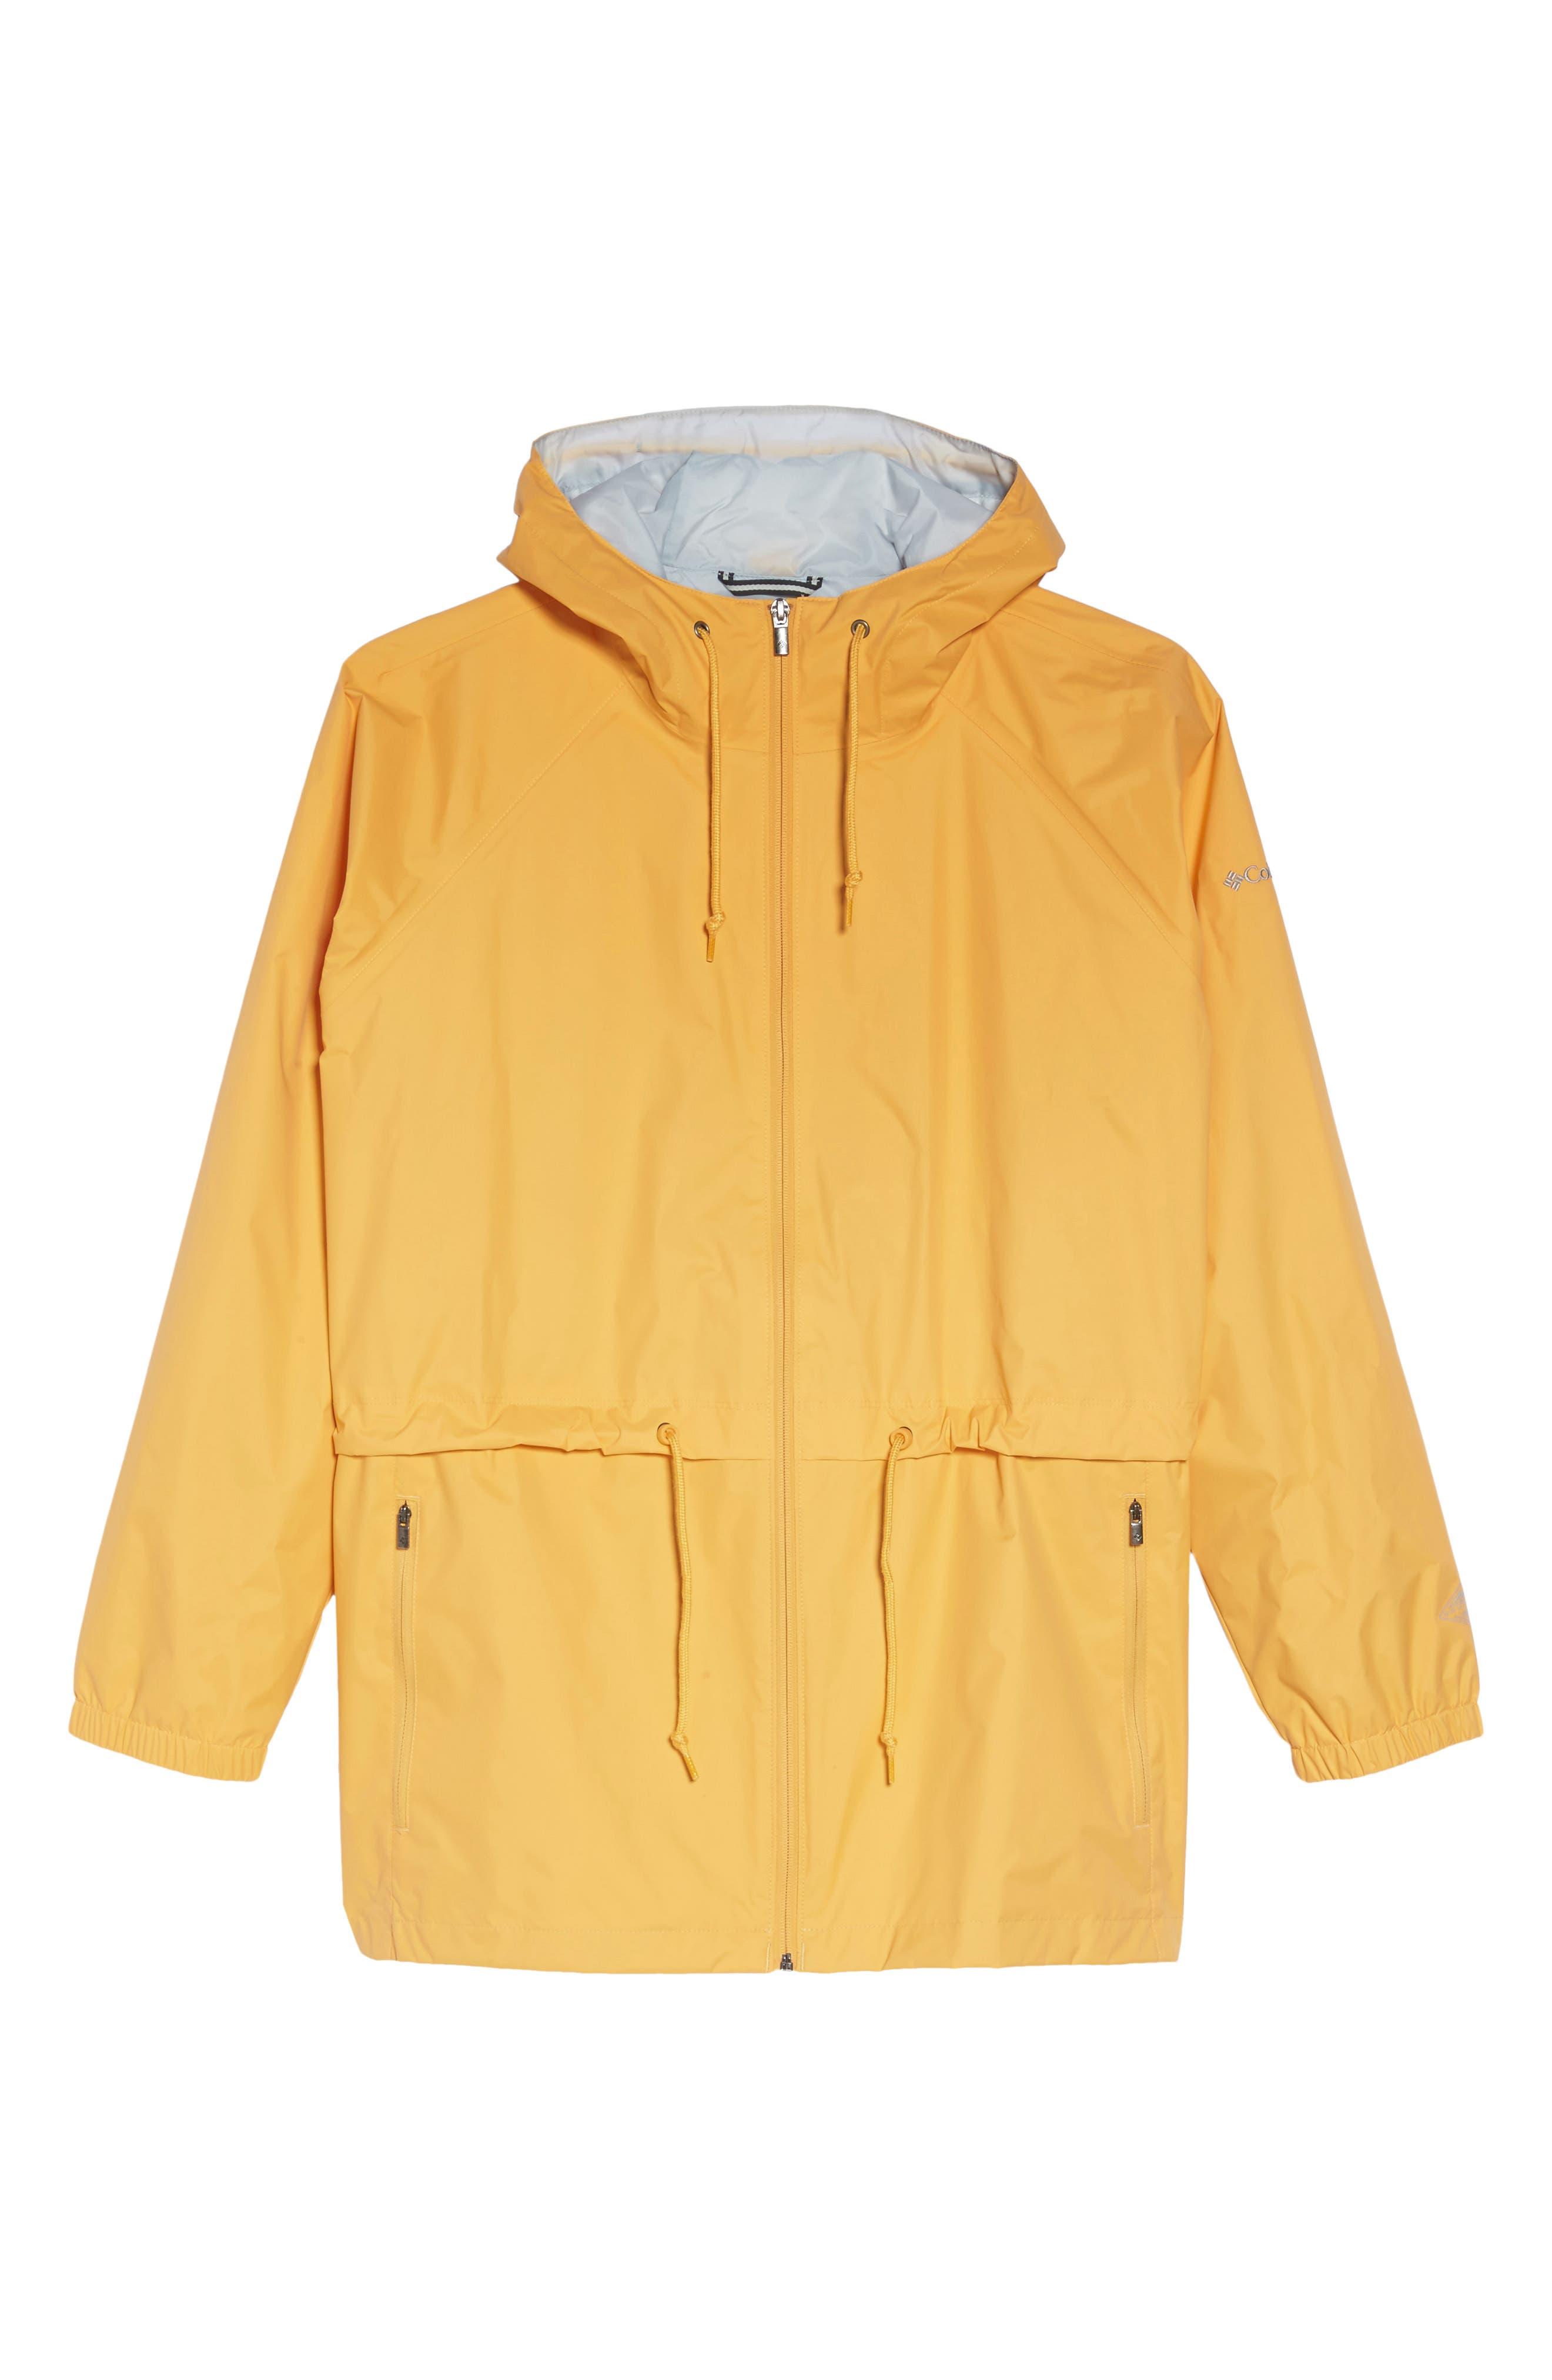 'Arcadia' Hooded Waterproof Casual Jacket,                             Alternate thumbnail 6, color,                             Yellow Ray Cirrus Grey